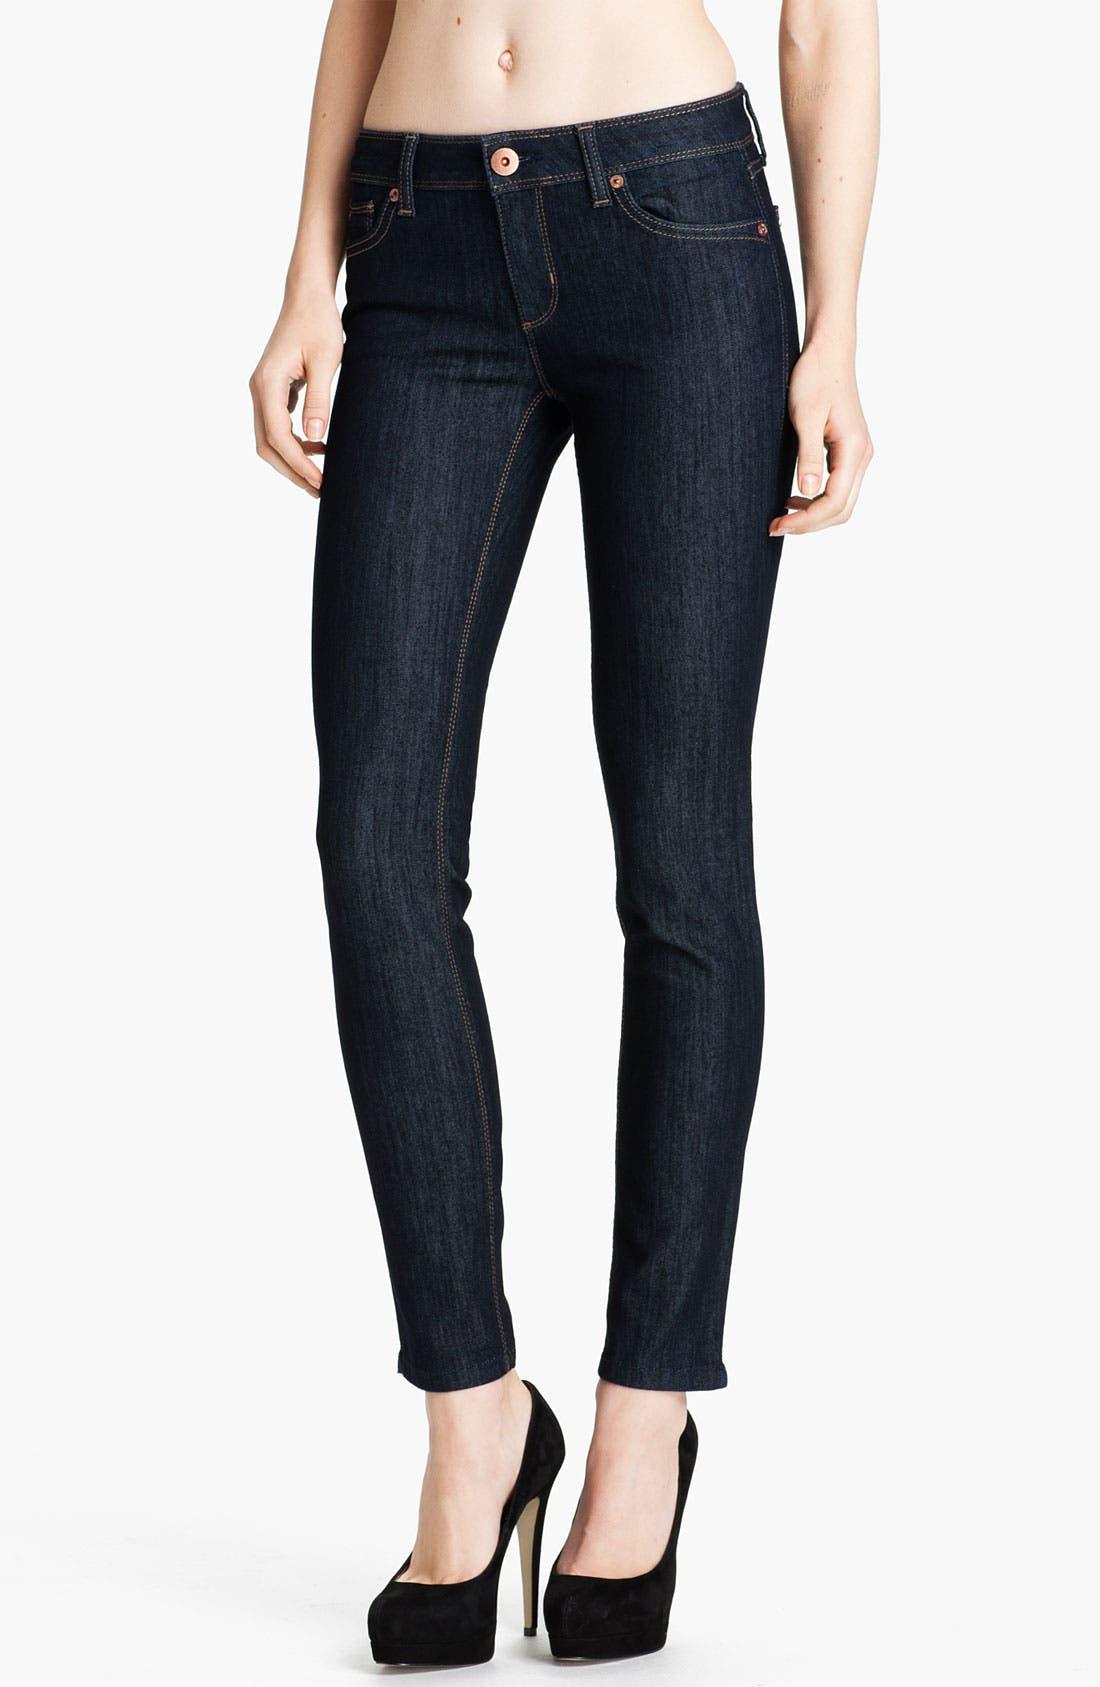 Alternate Image 1 Selected - DL1961 'Angel' Skinny Ankle Jeans (Crush)